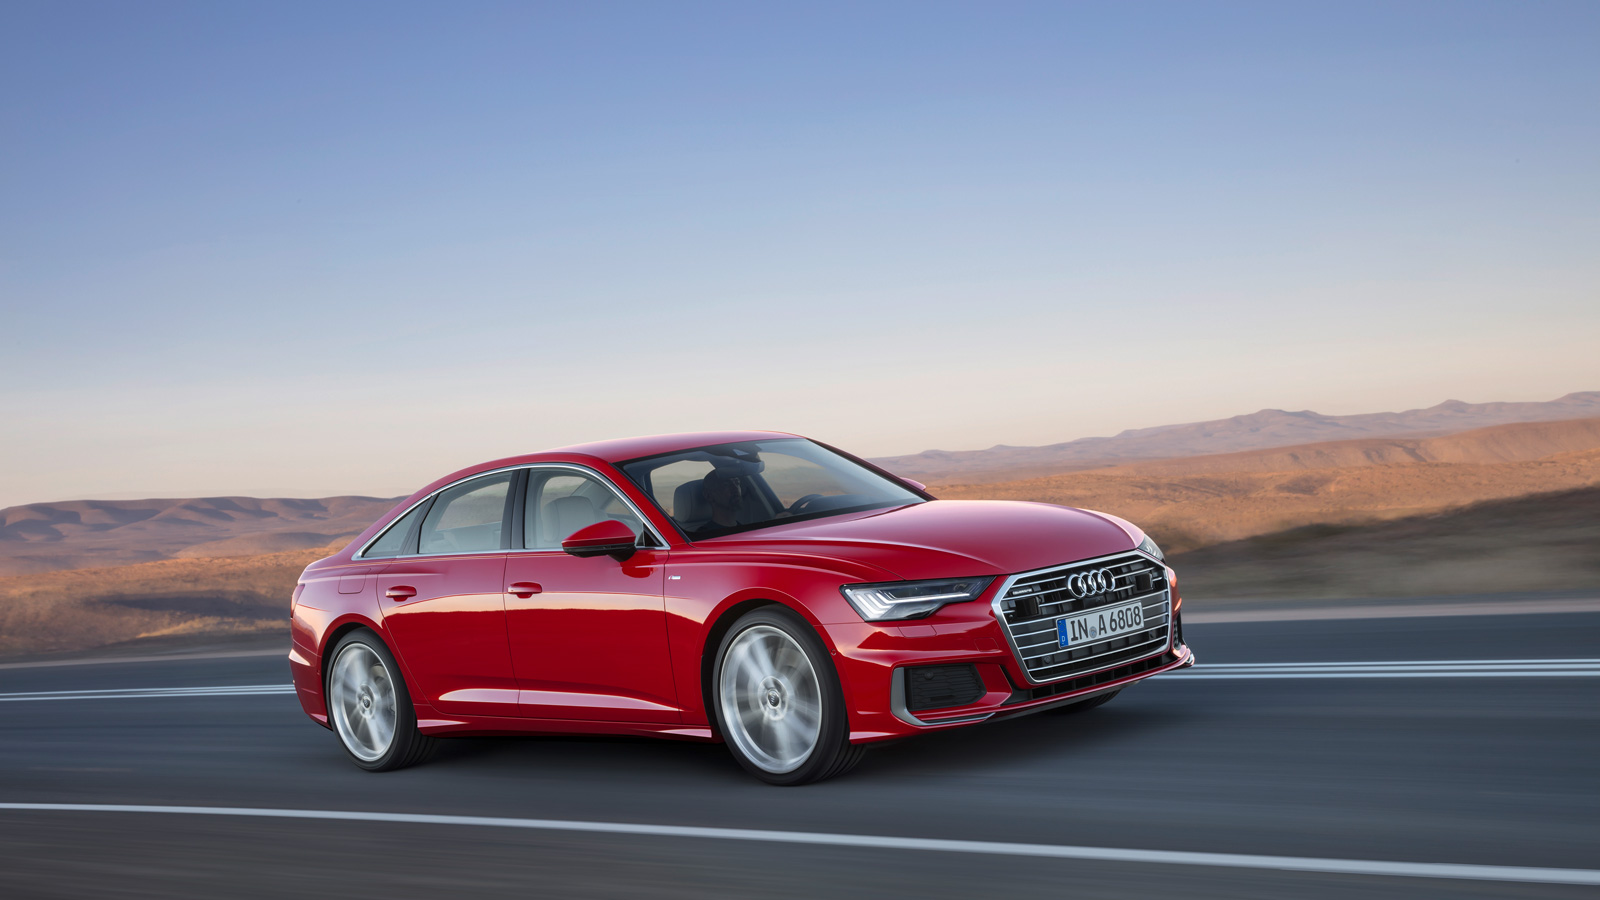 Audi-TTS-Launch-Edition-USA-Sewell-Audi-North-Houston-309